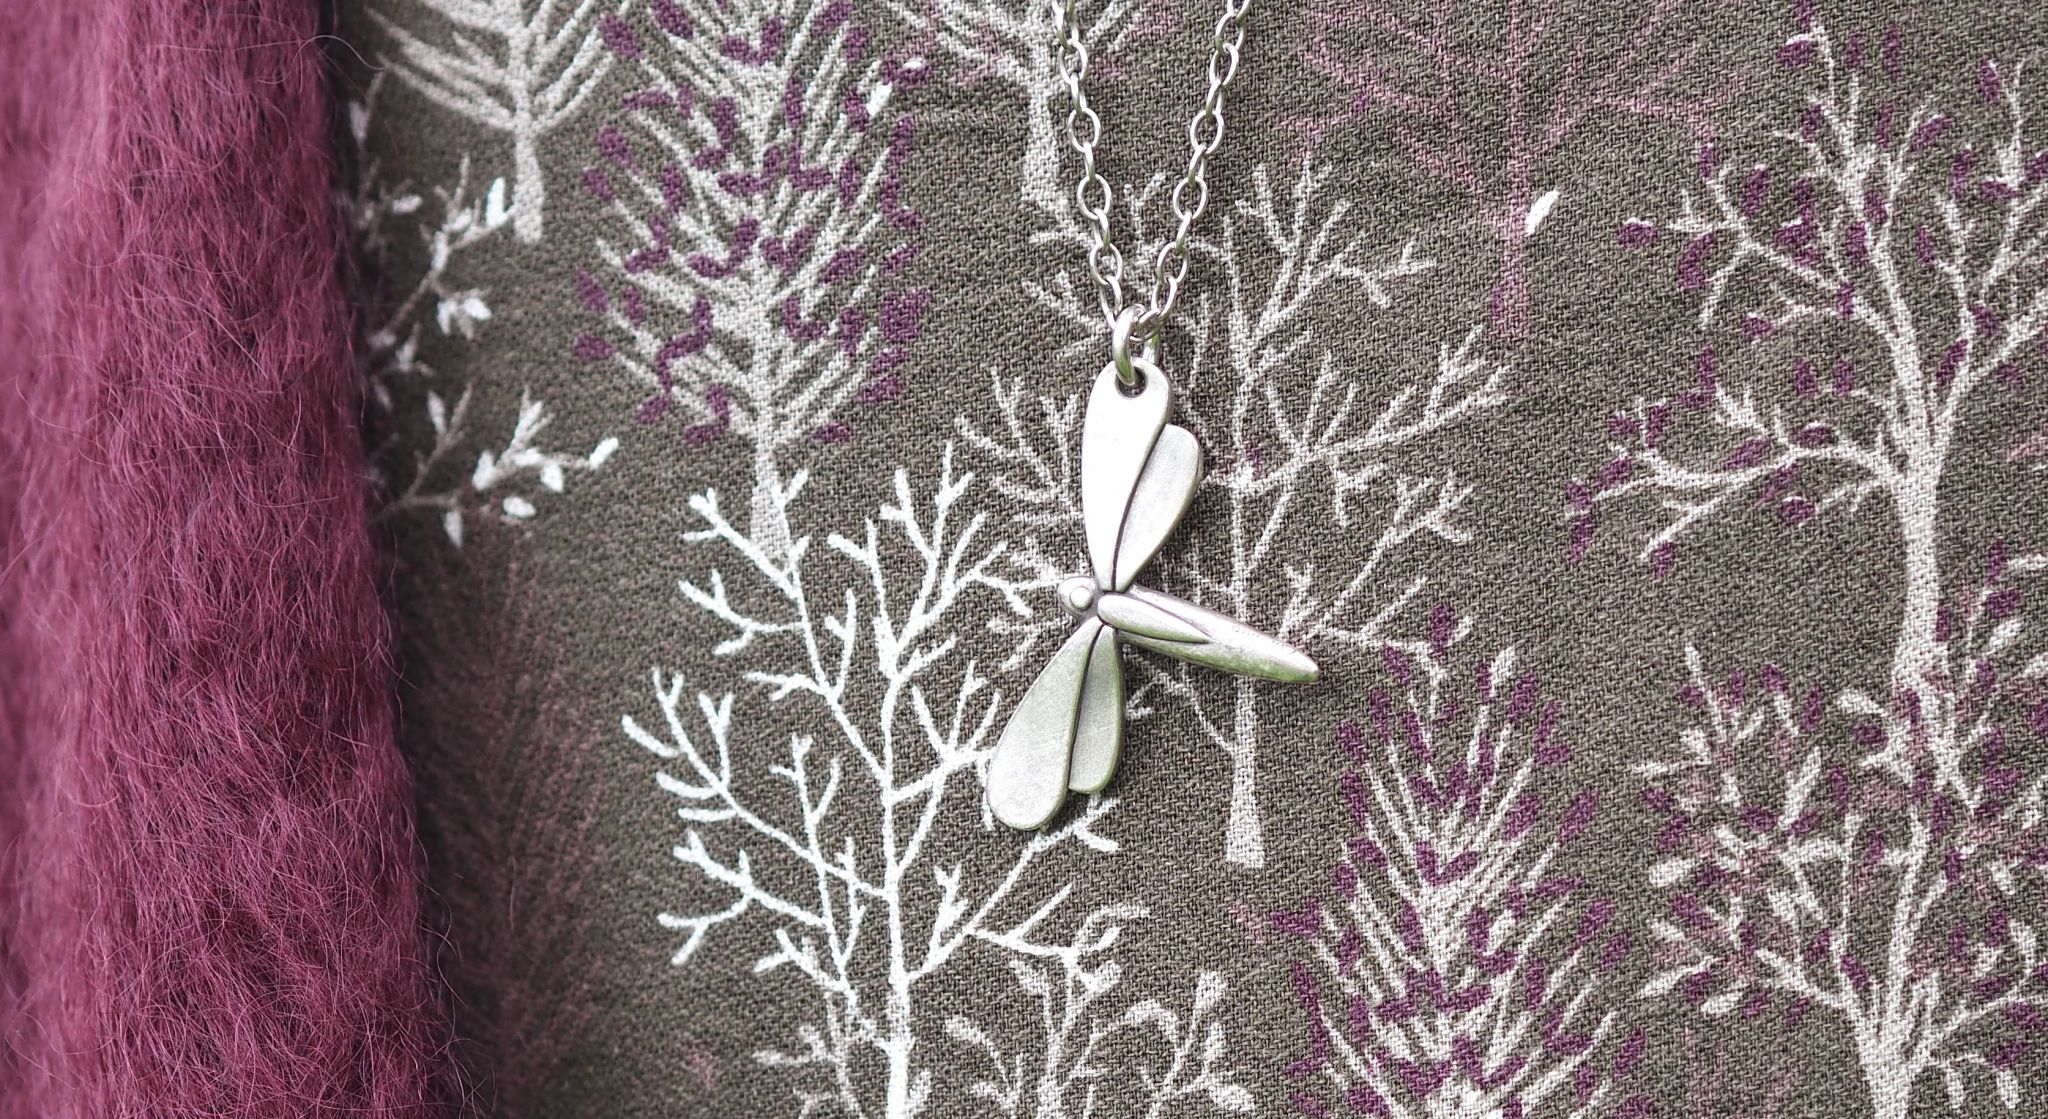 what-lizzy-loves-khaki-tunic-dress-autumn-style-leather-handbag-dragonfly-pendant